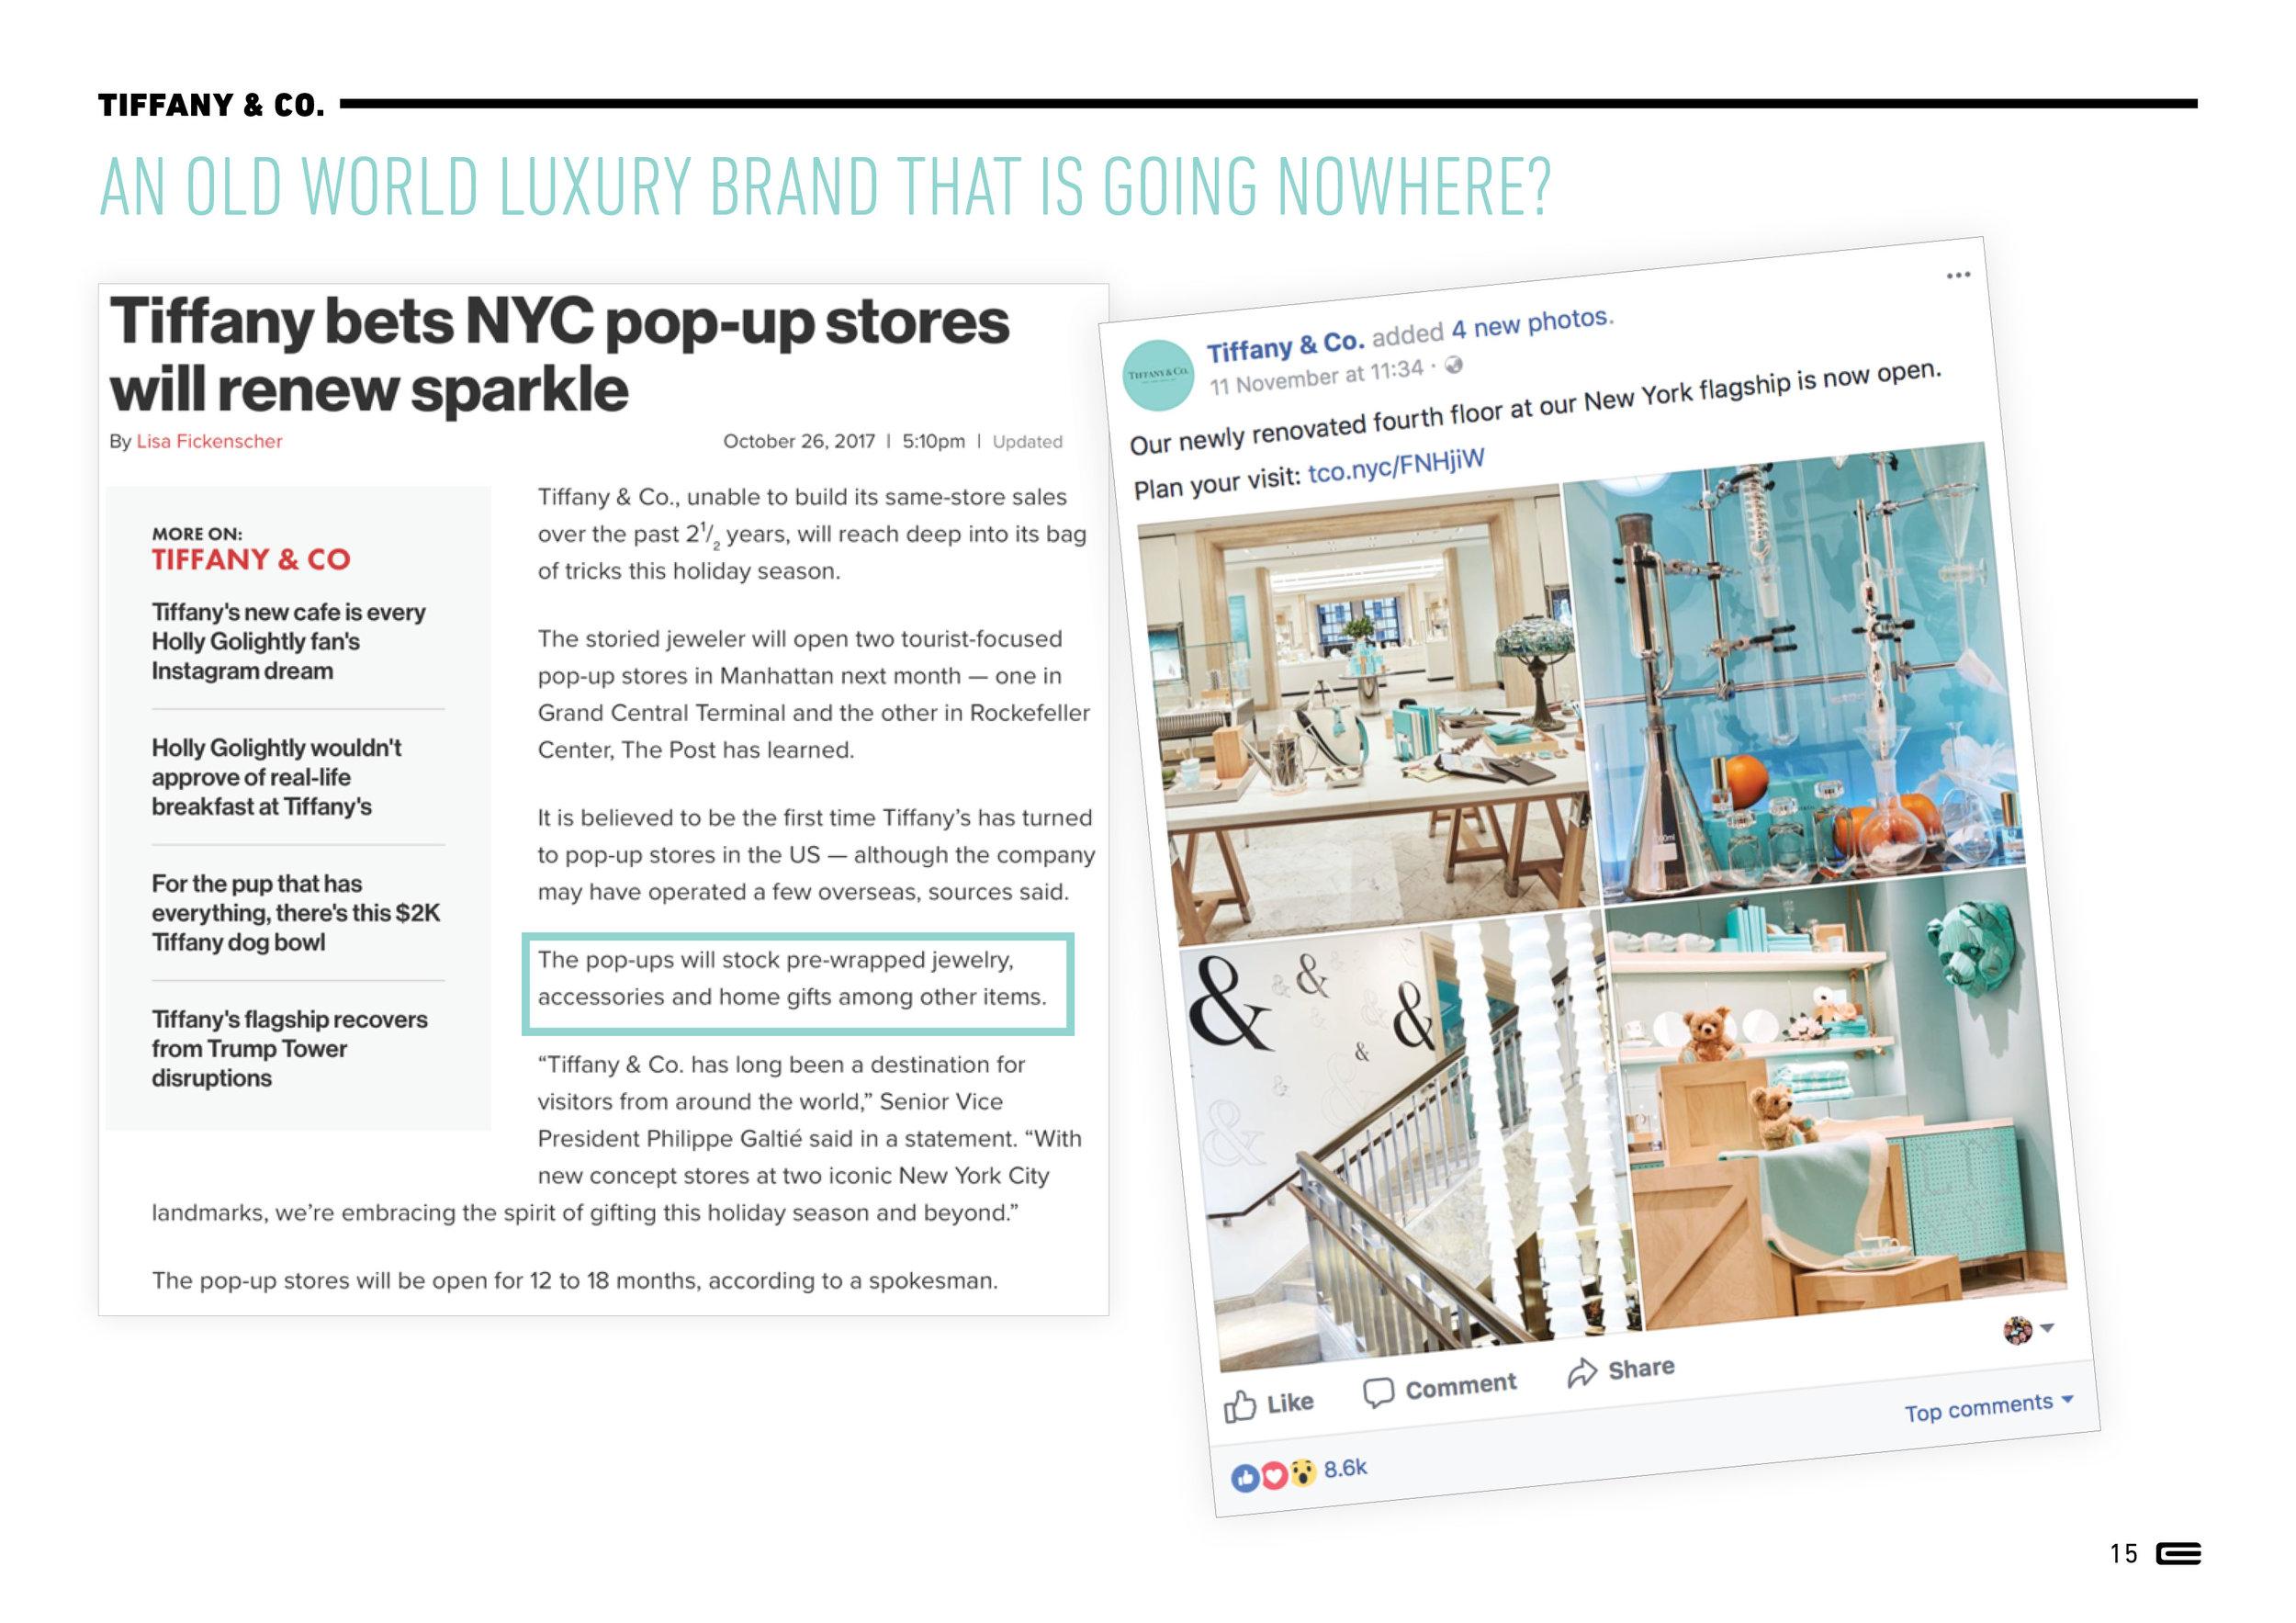 EC - VIC 2018 Presentation on Tiffany15.jpg